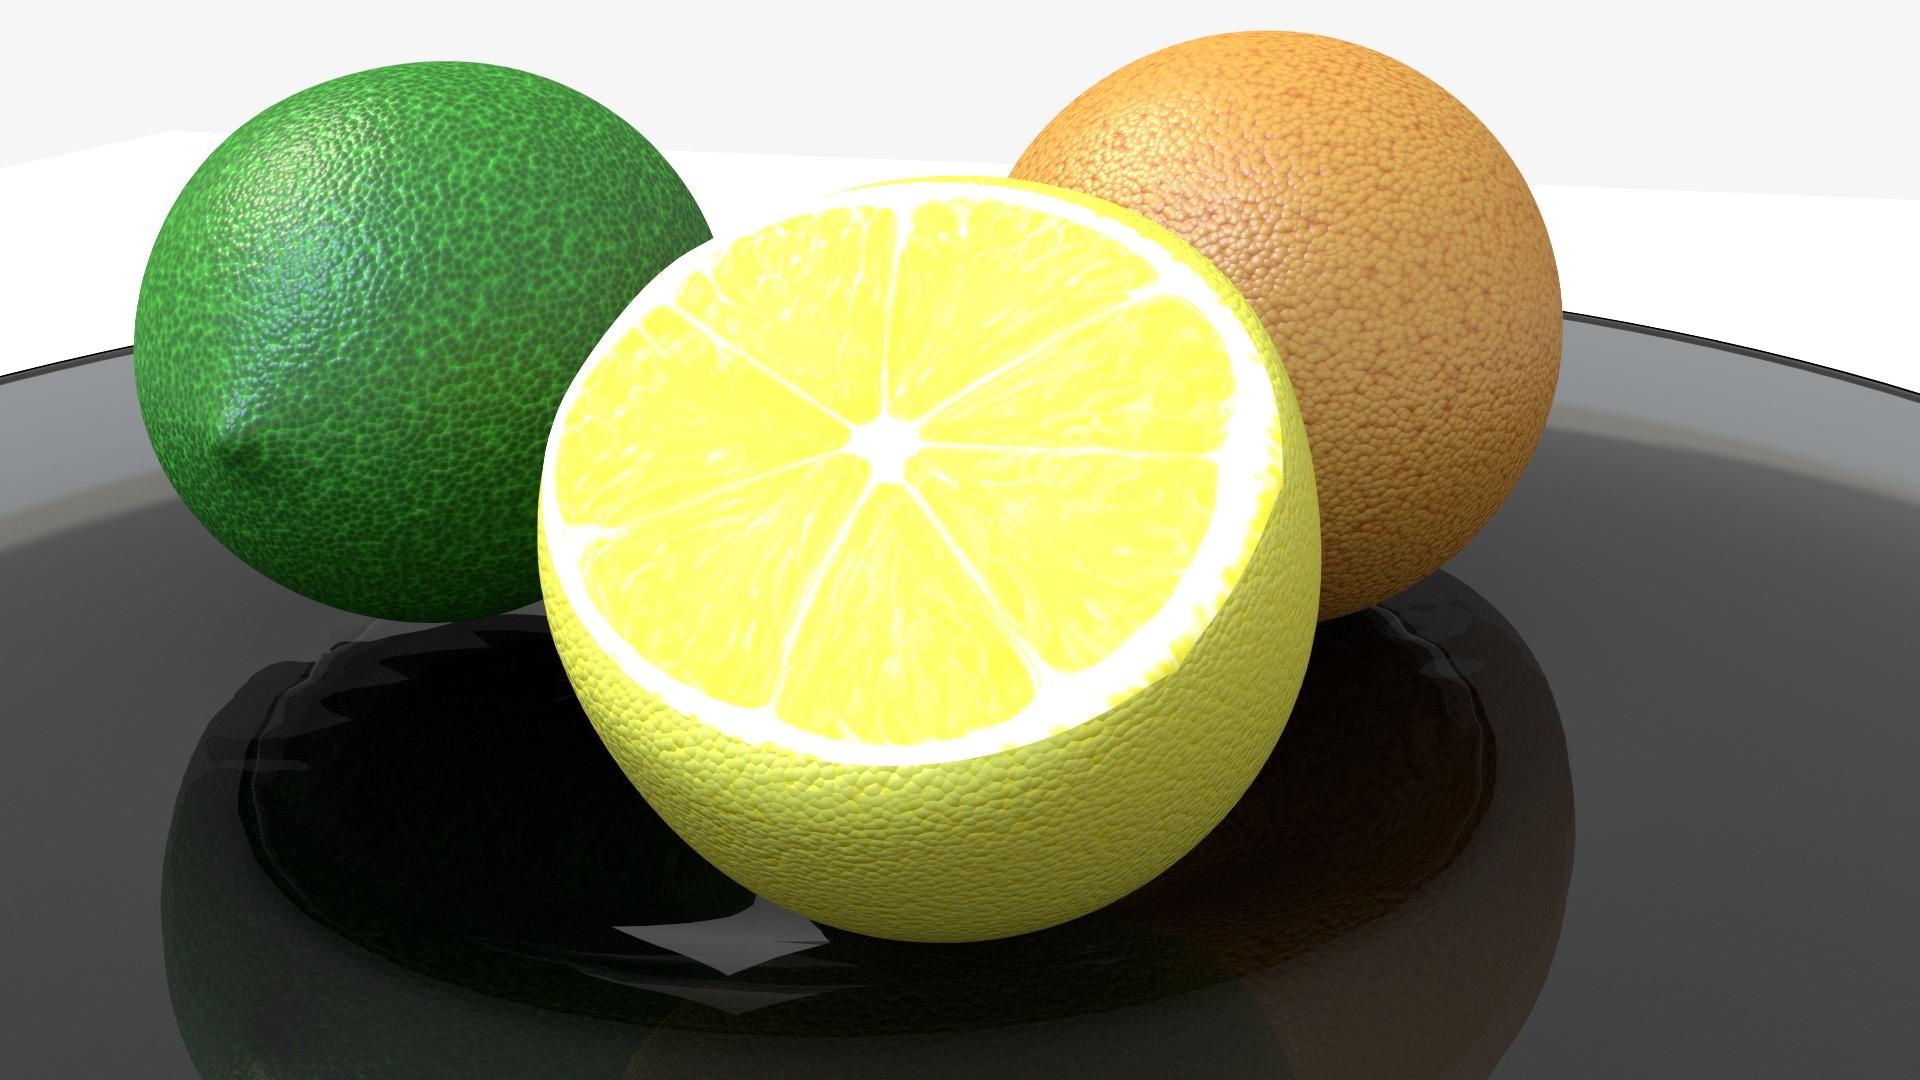 Lime Lemon Orange Wallpaper Hd 3d 4k Wallpapers Images